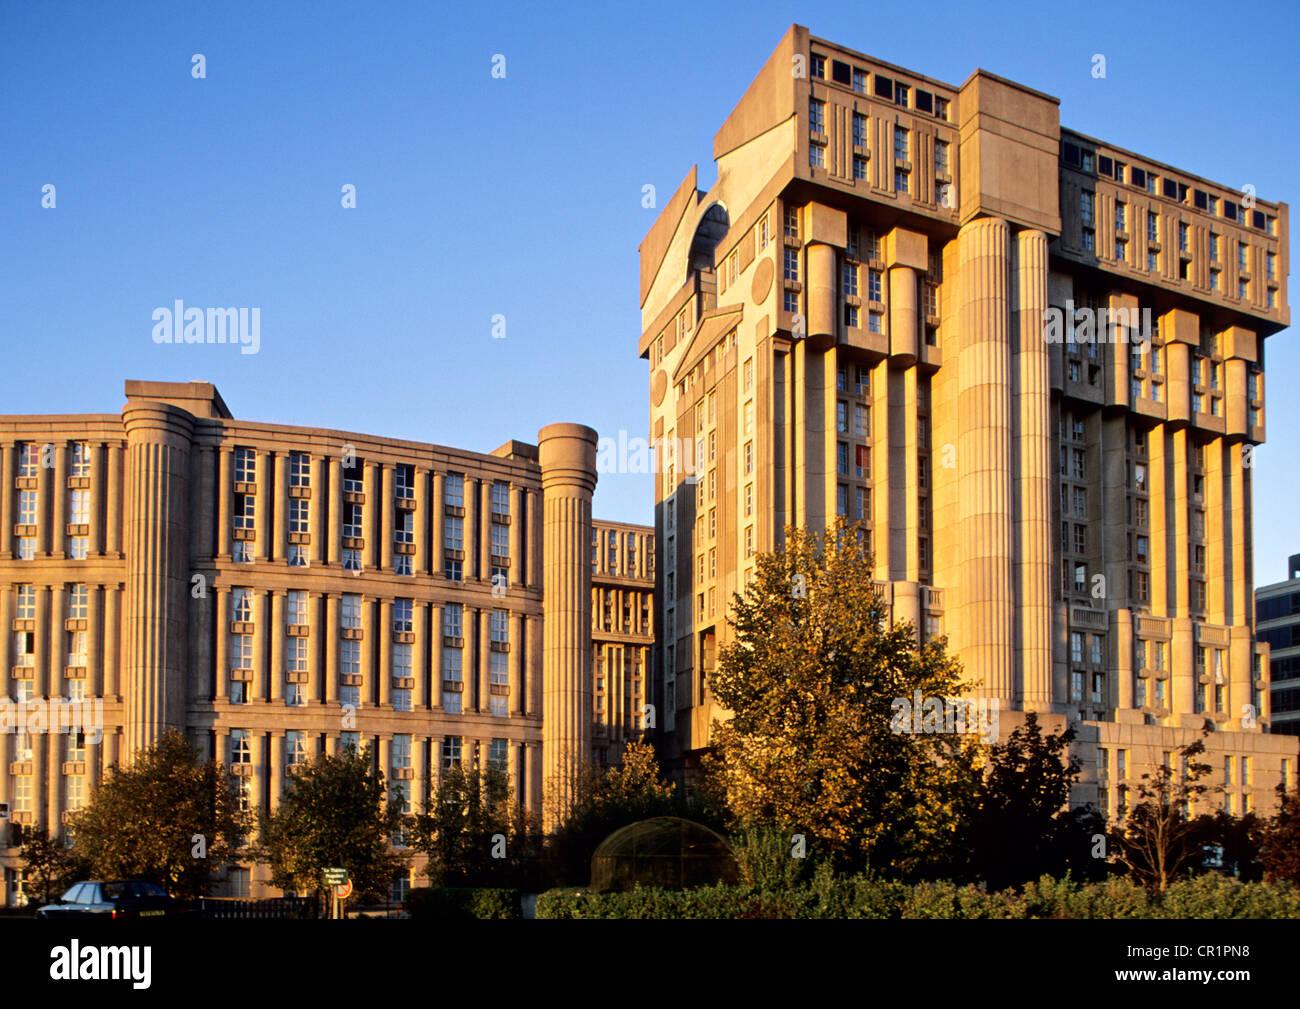 Noisy Le Grand Architecture france, seine saint denis, new town of noisy le grand